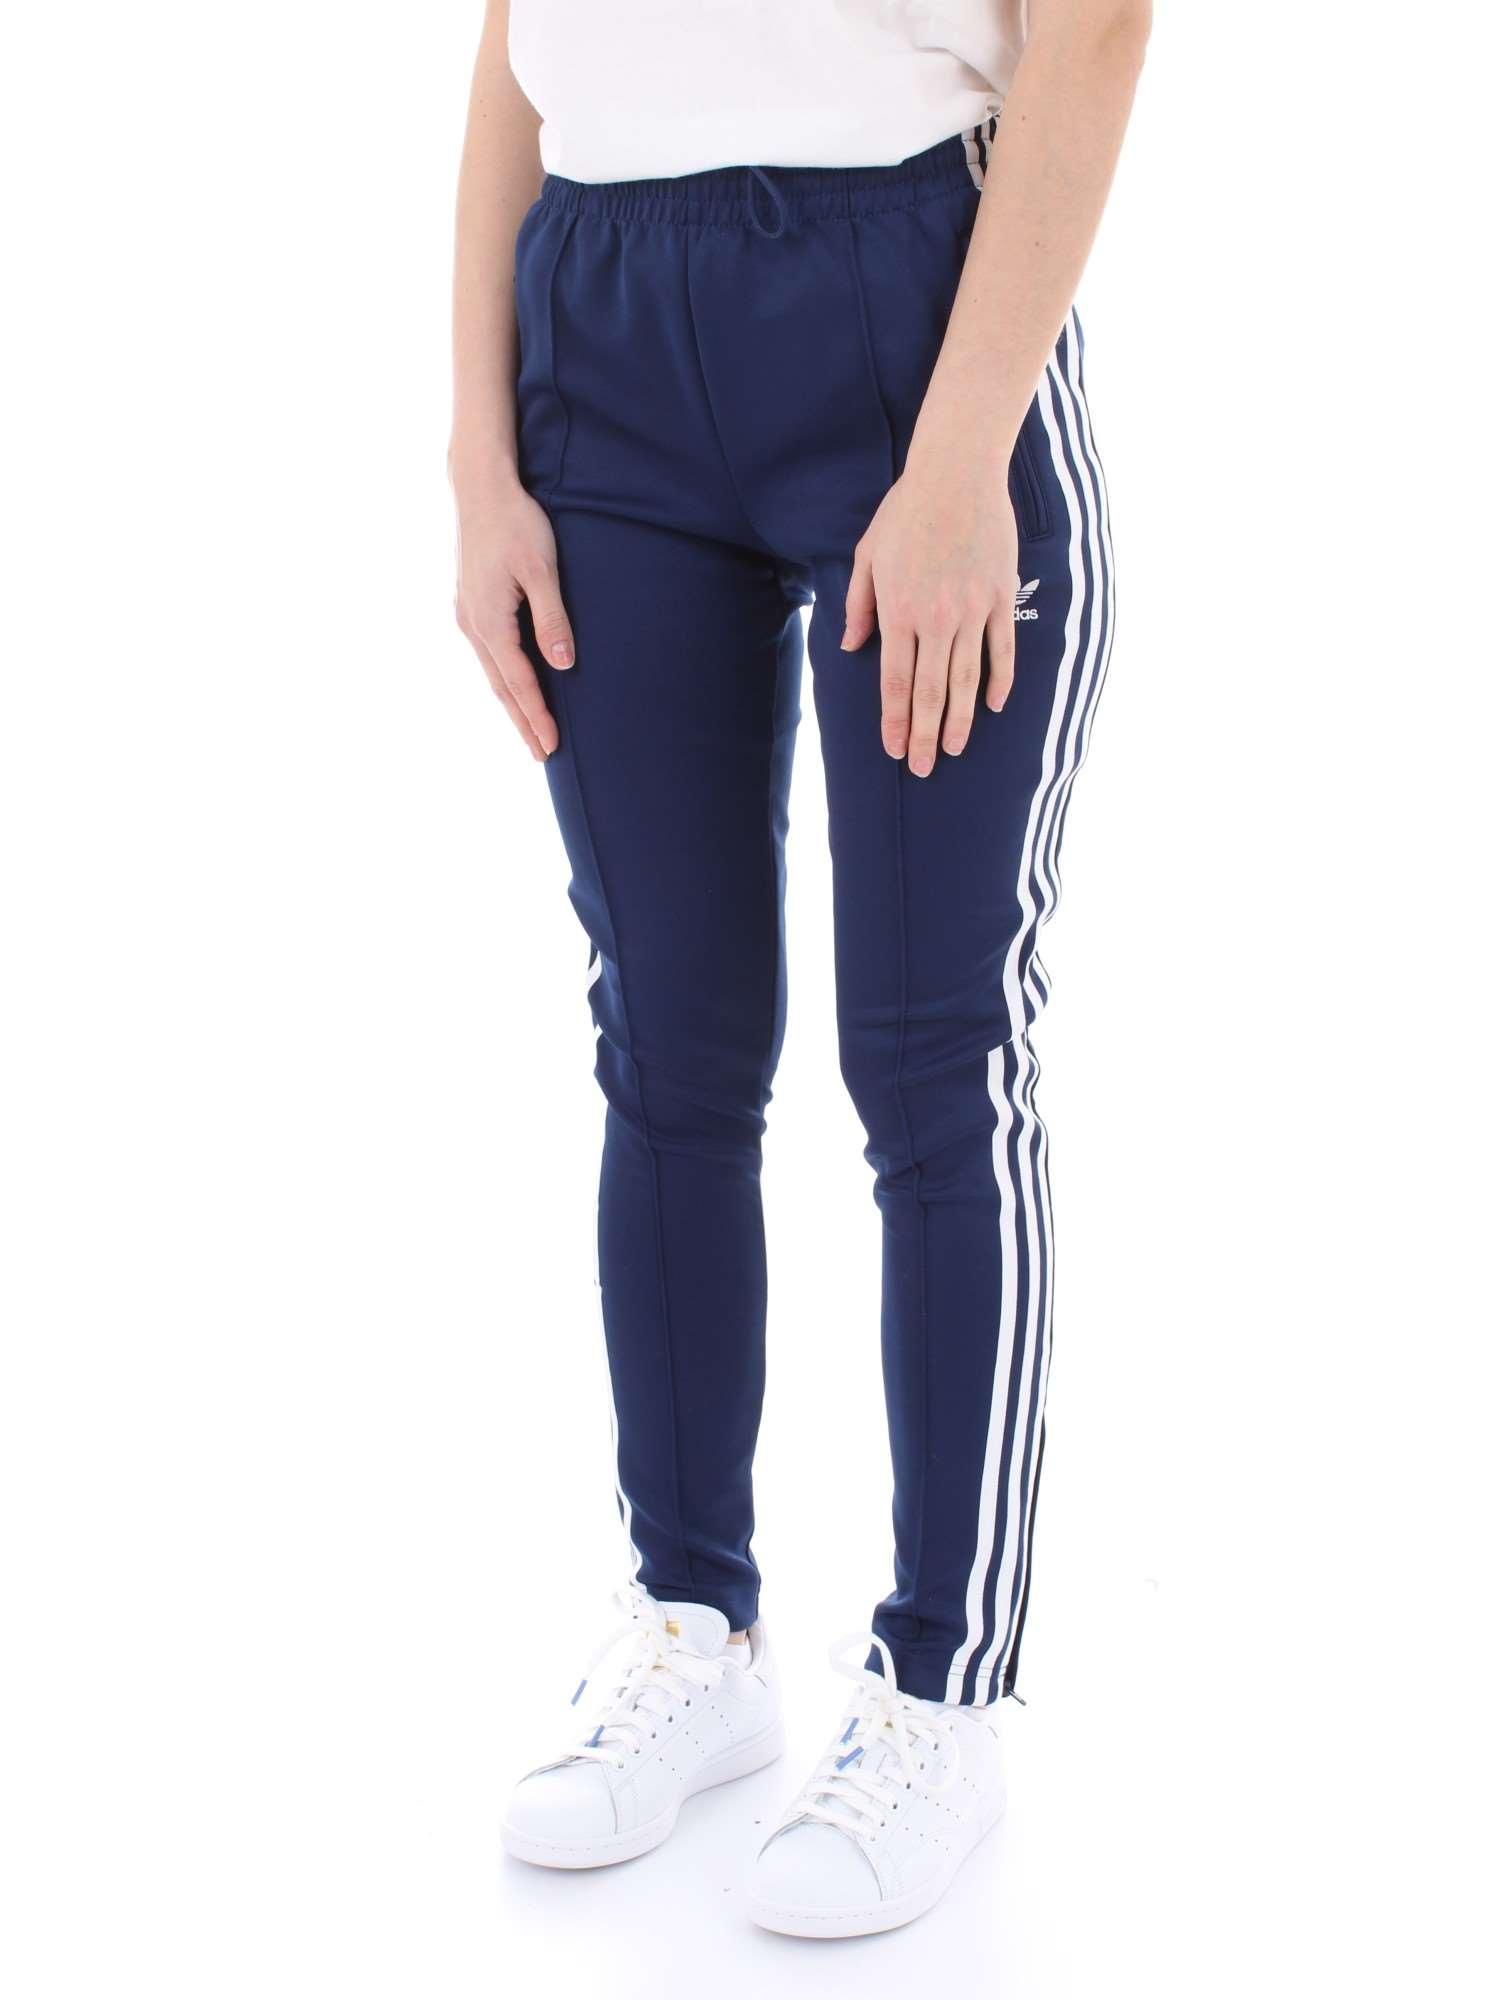 Dv2639 Adidas blu Femme Pantalon Bleu été Printemps JcTFK1l